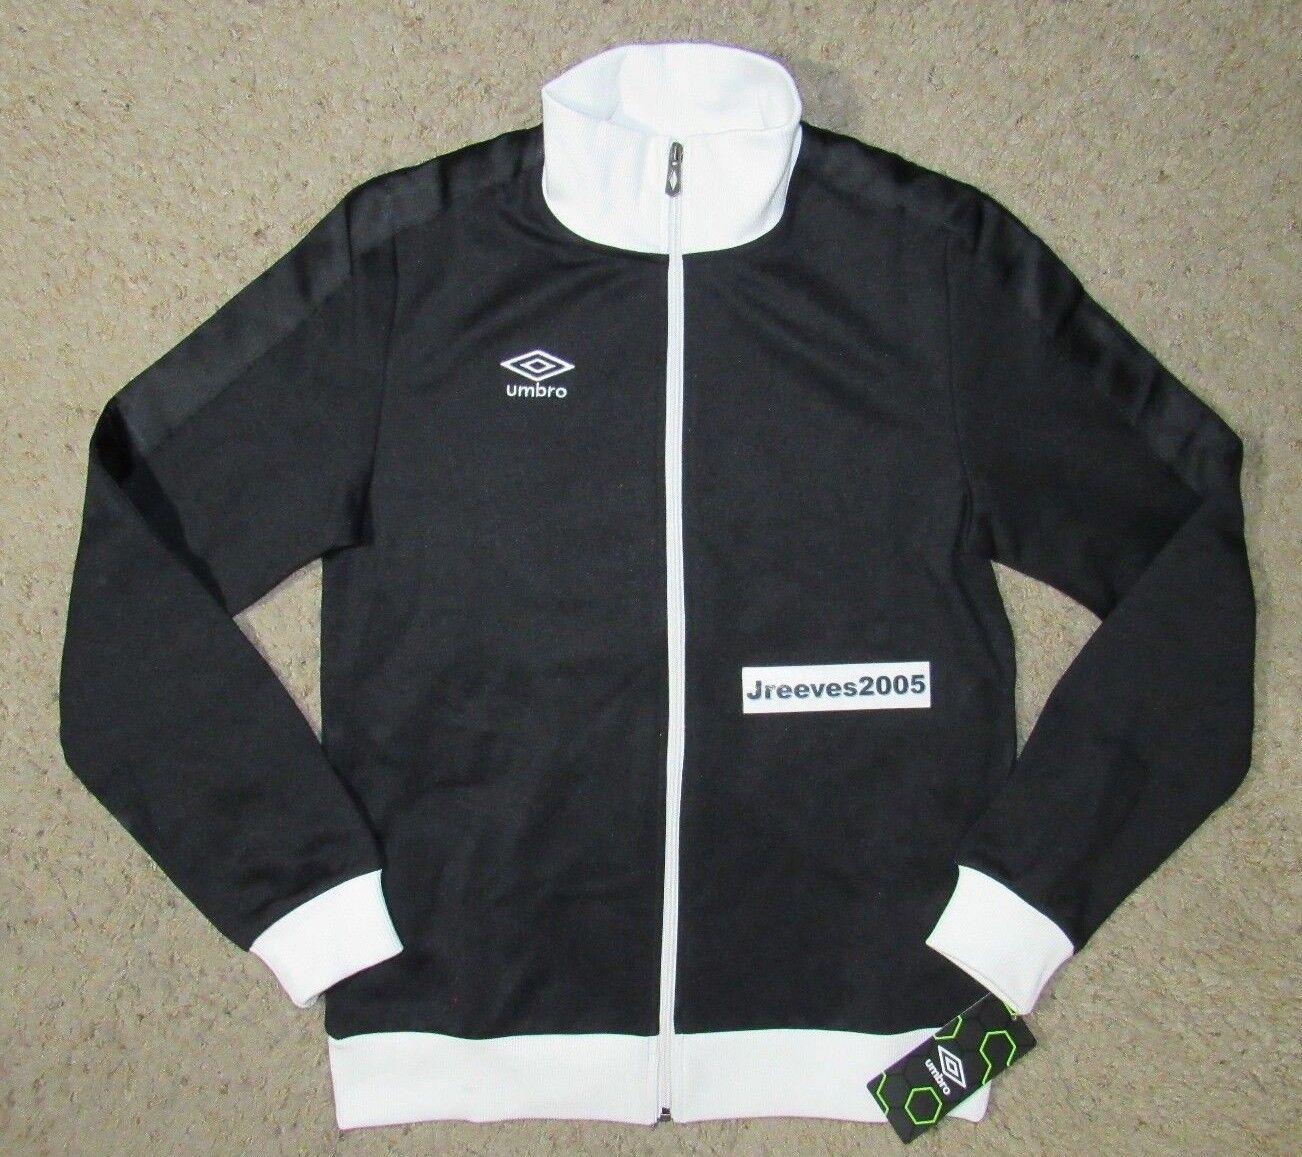 umbro diamond jacket